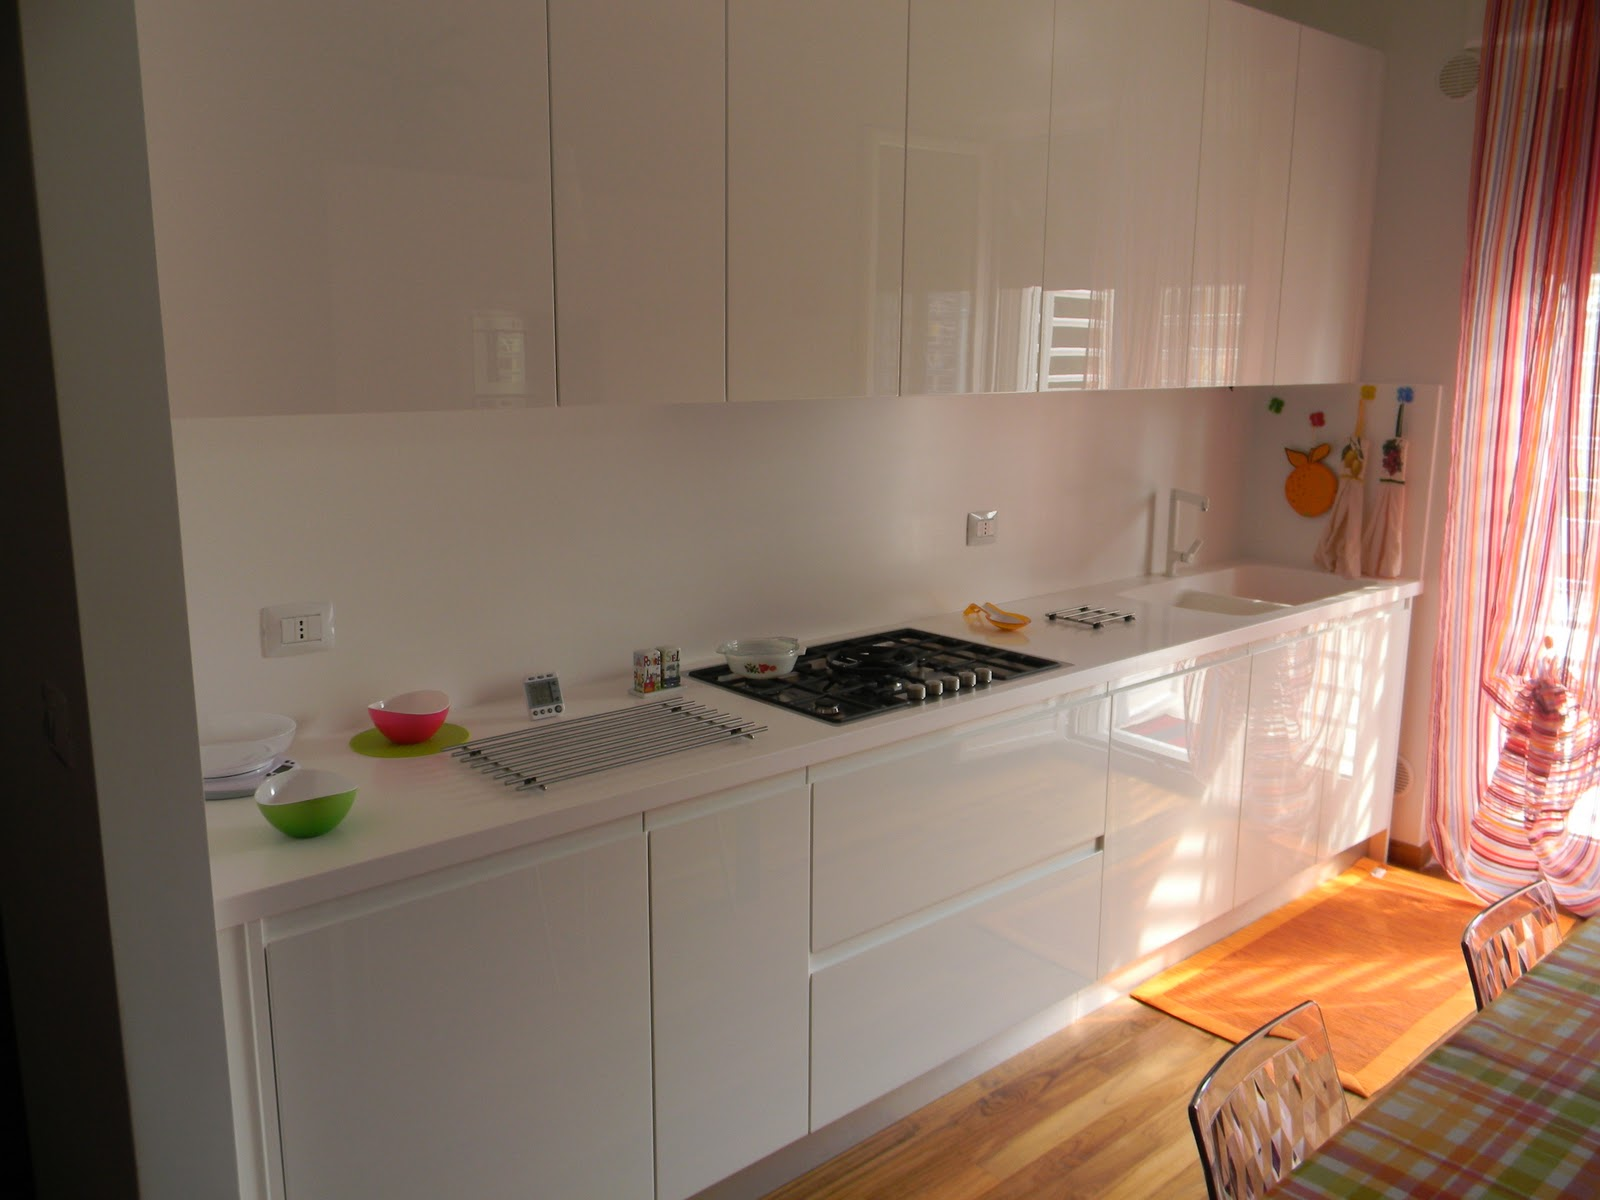 Carlino Antonio: Cucina Laccata bianca Lucida